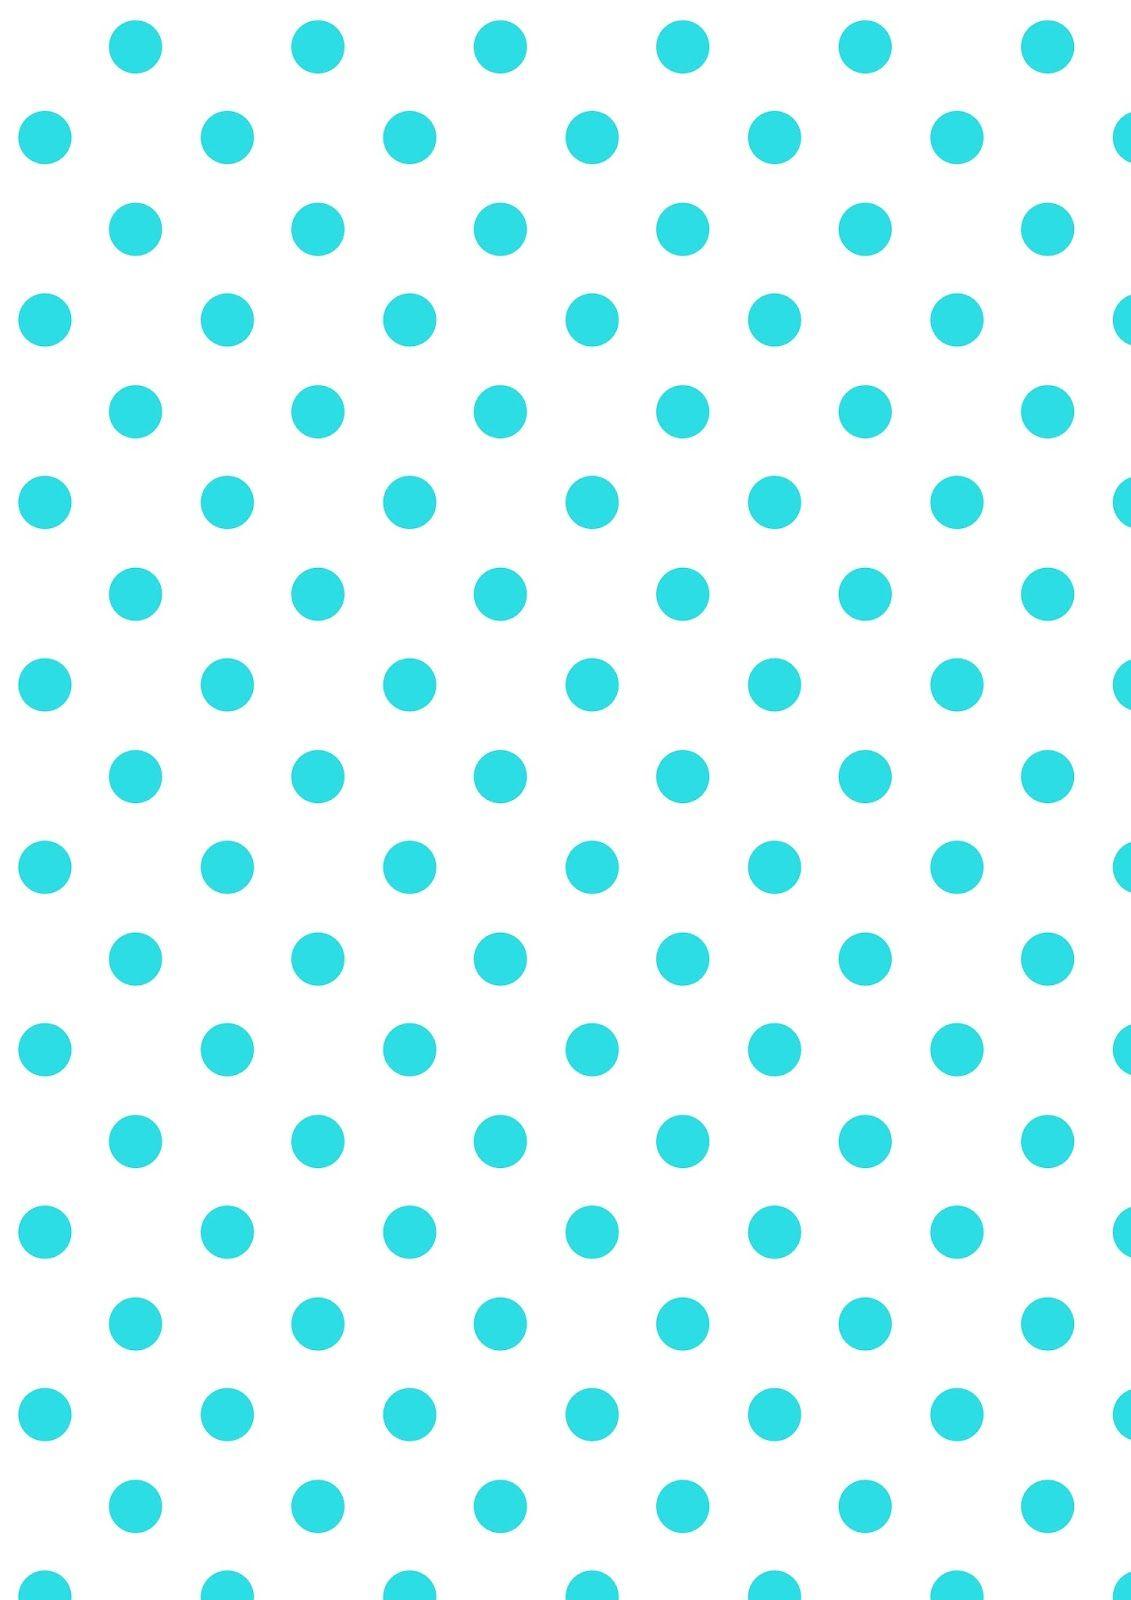 Free digital polka dot scrapbooking papers - ausdruckbare ...